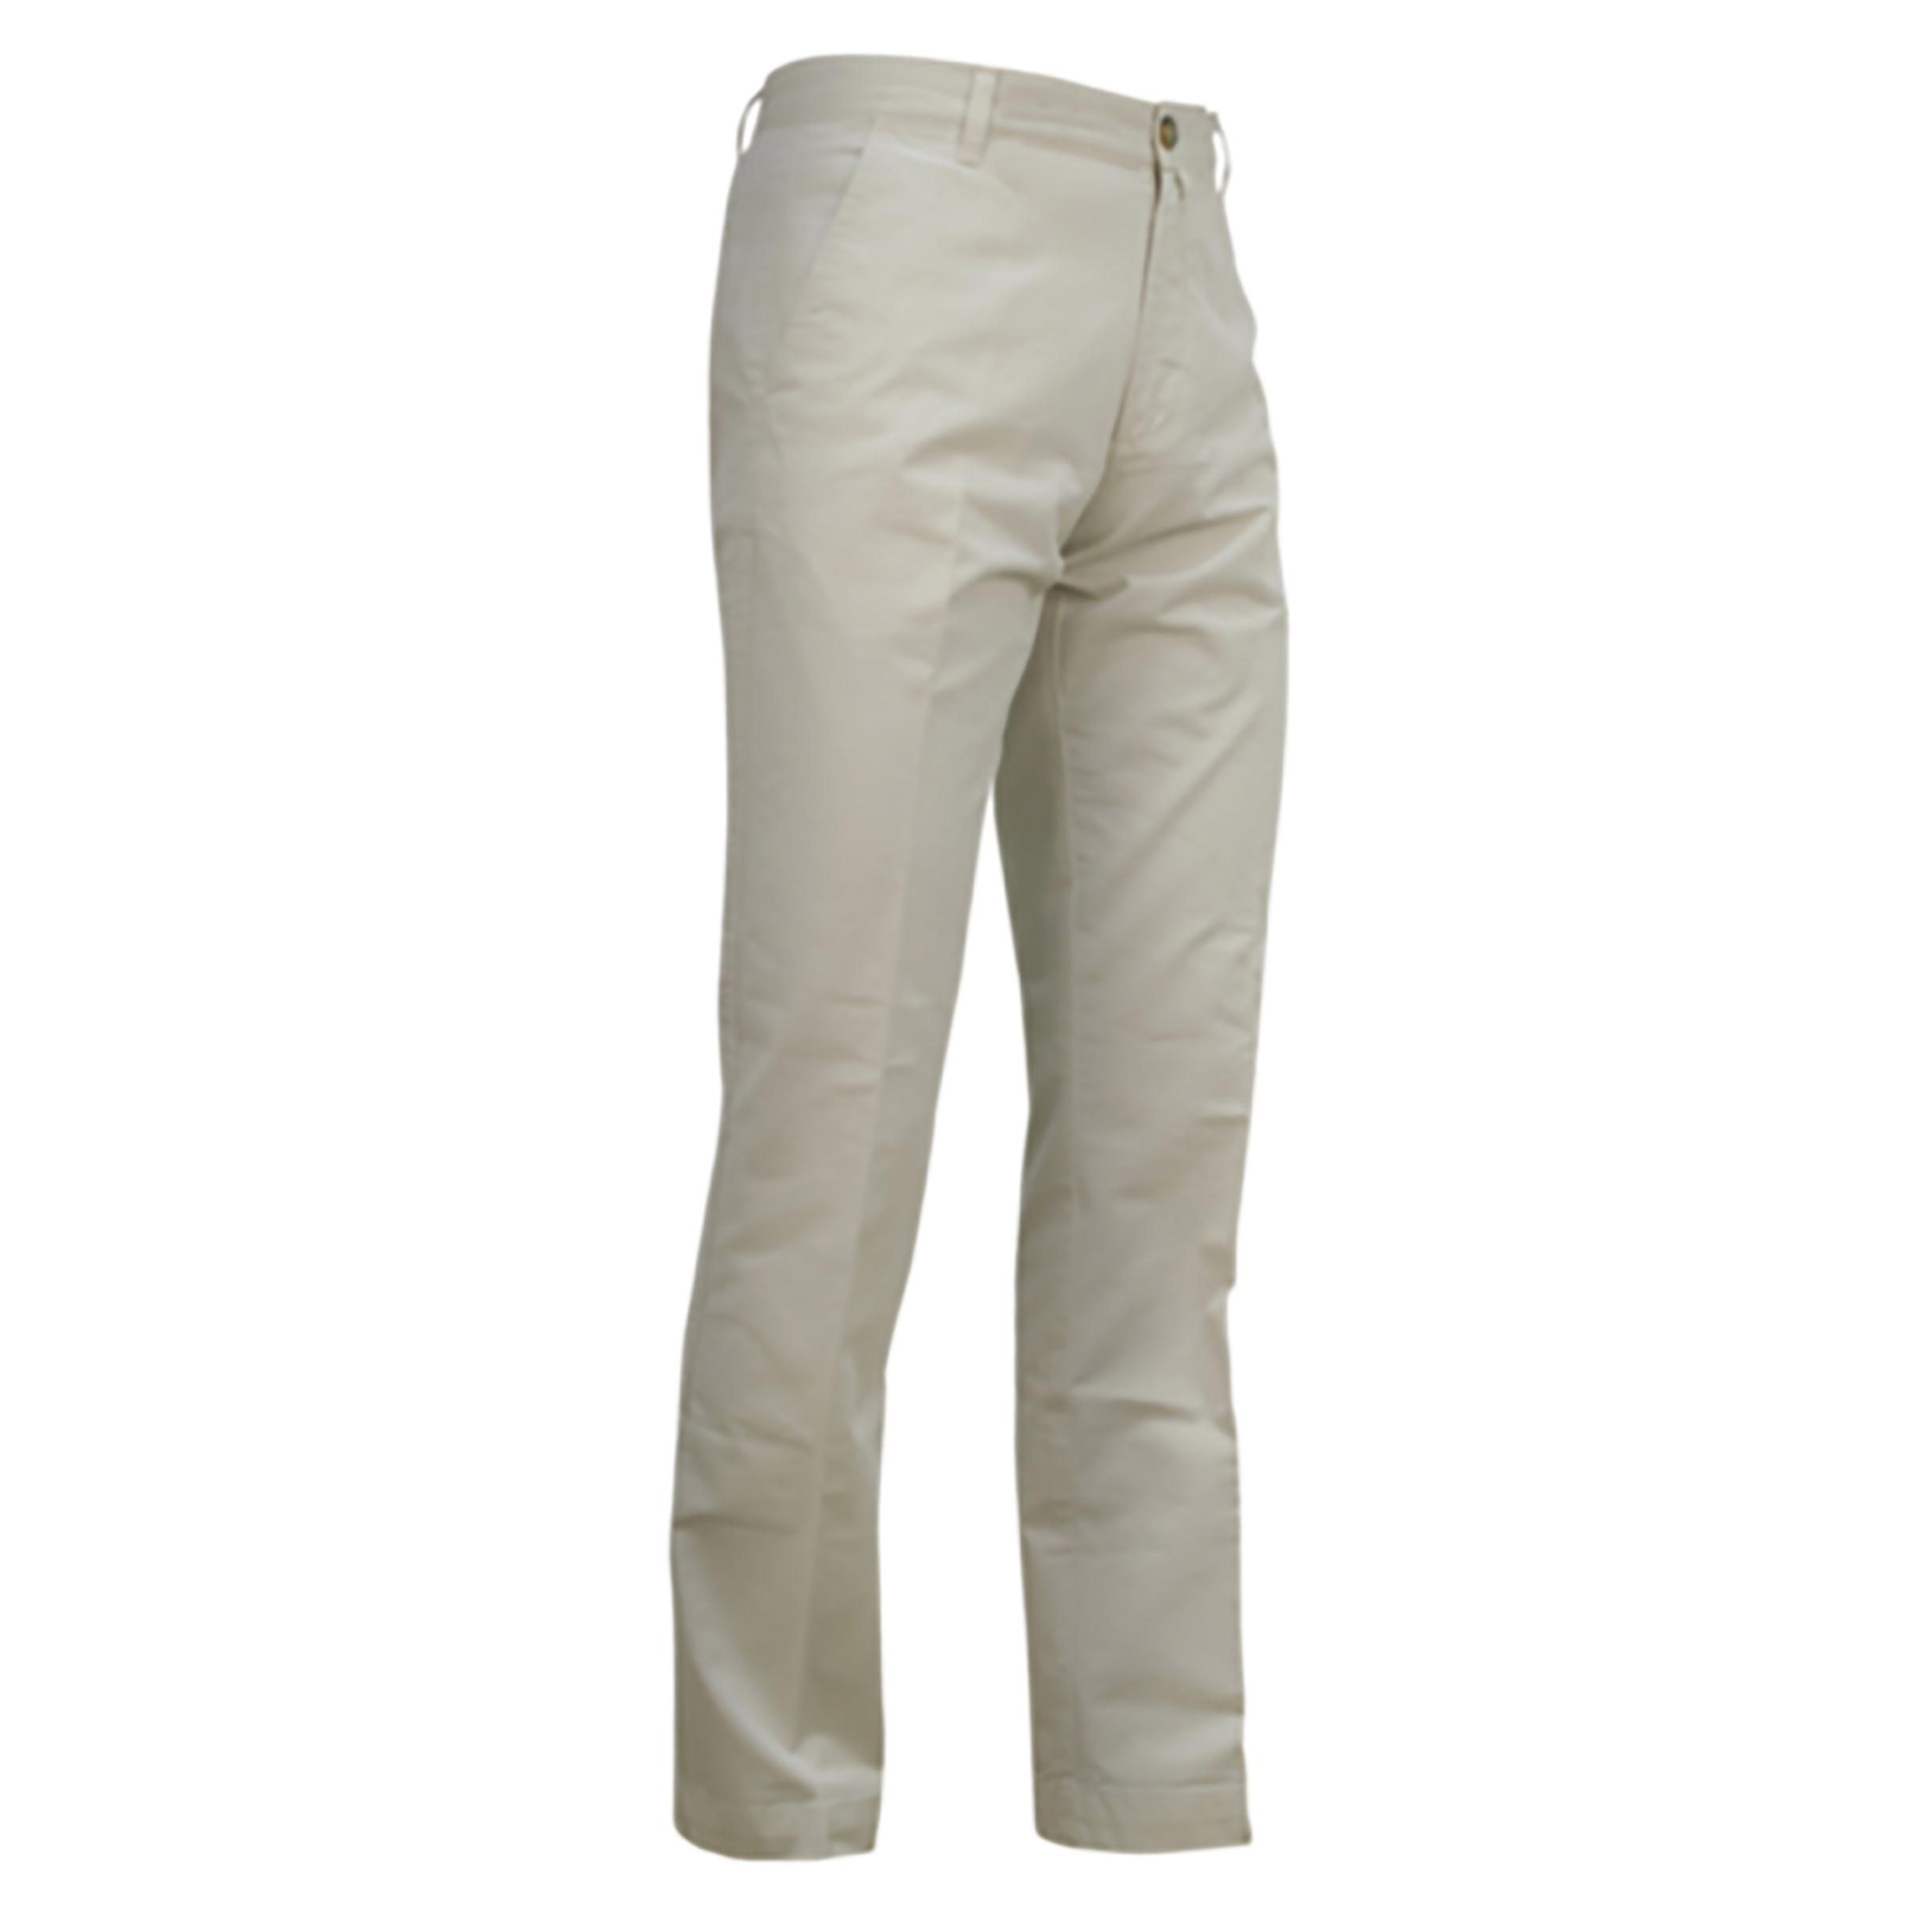 Deluxe Trouser  - man